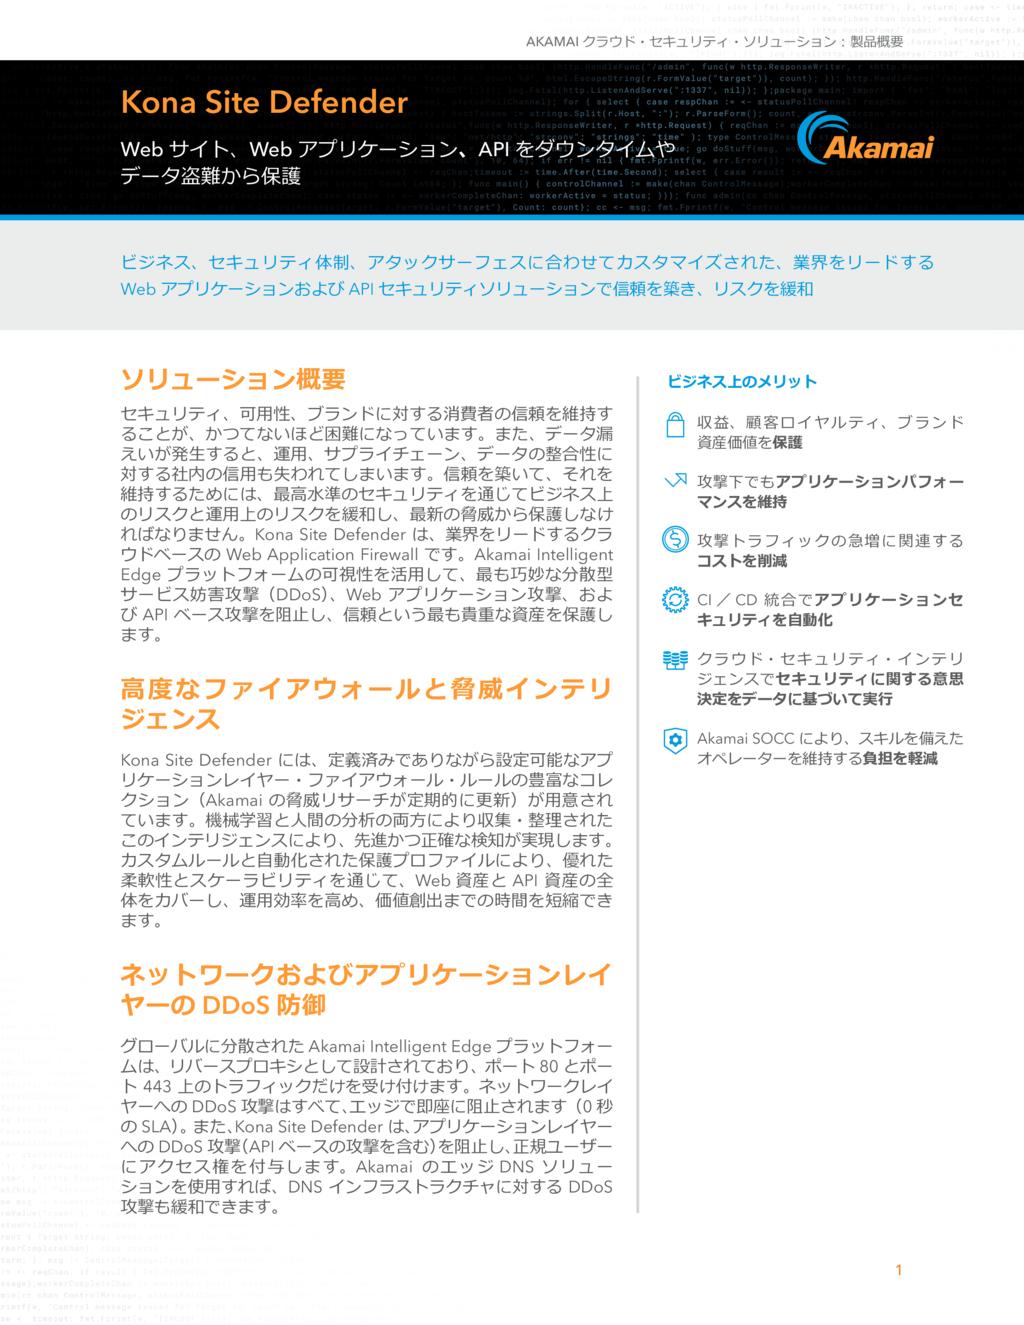 Kona Site Defenderの資料